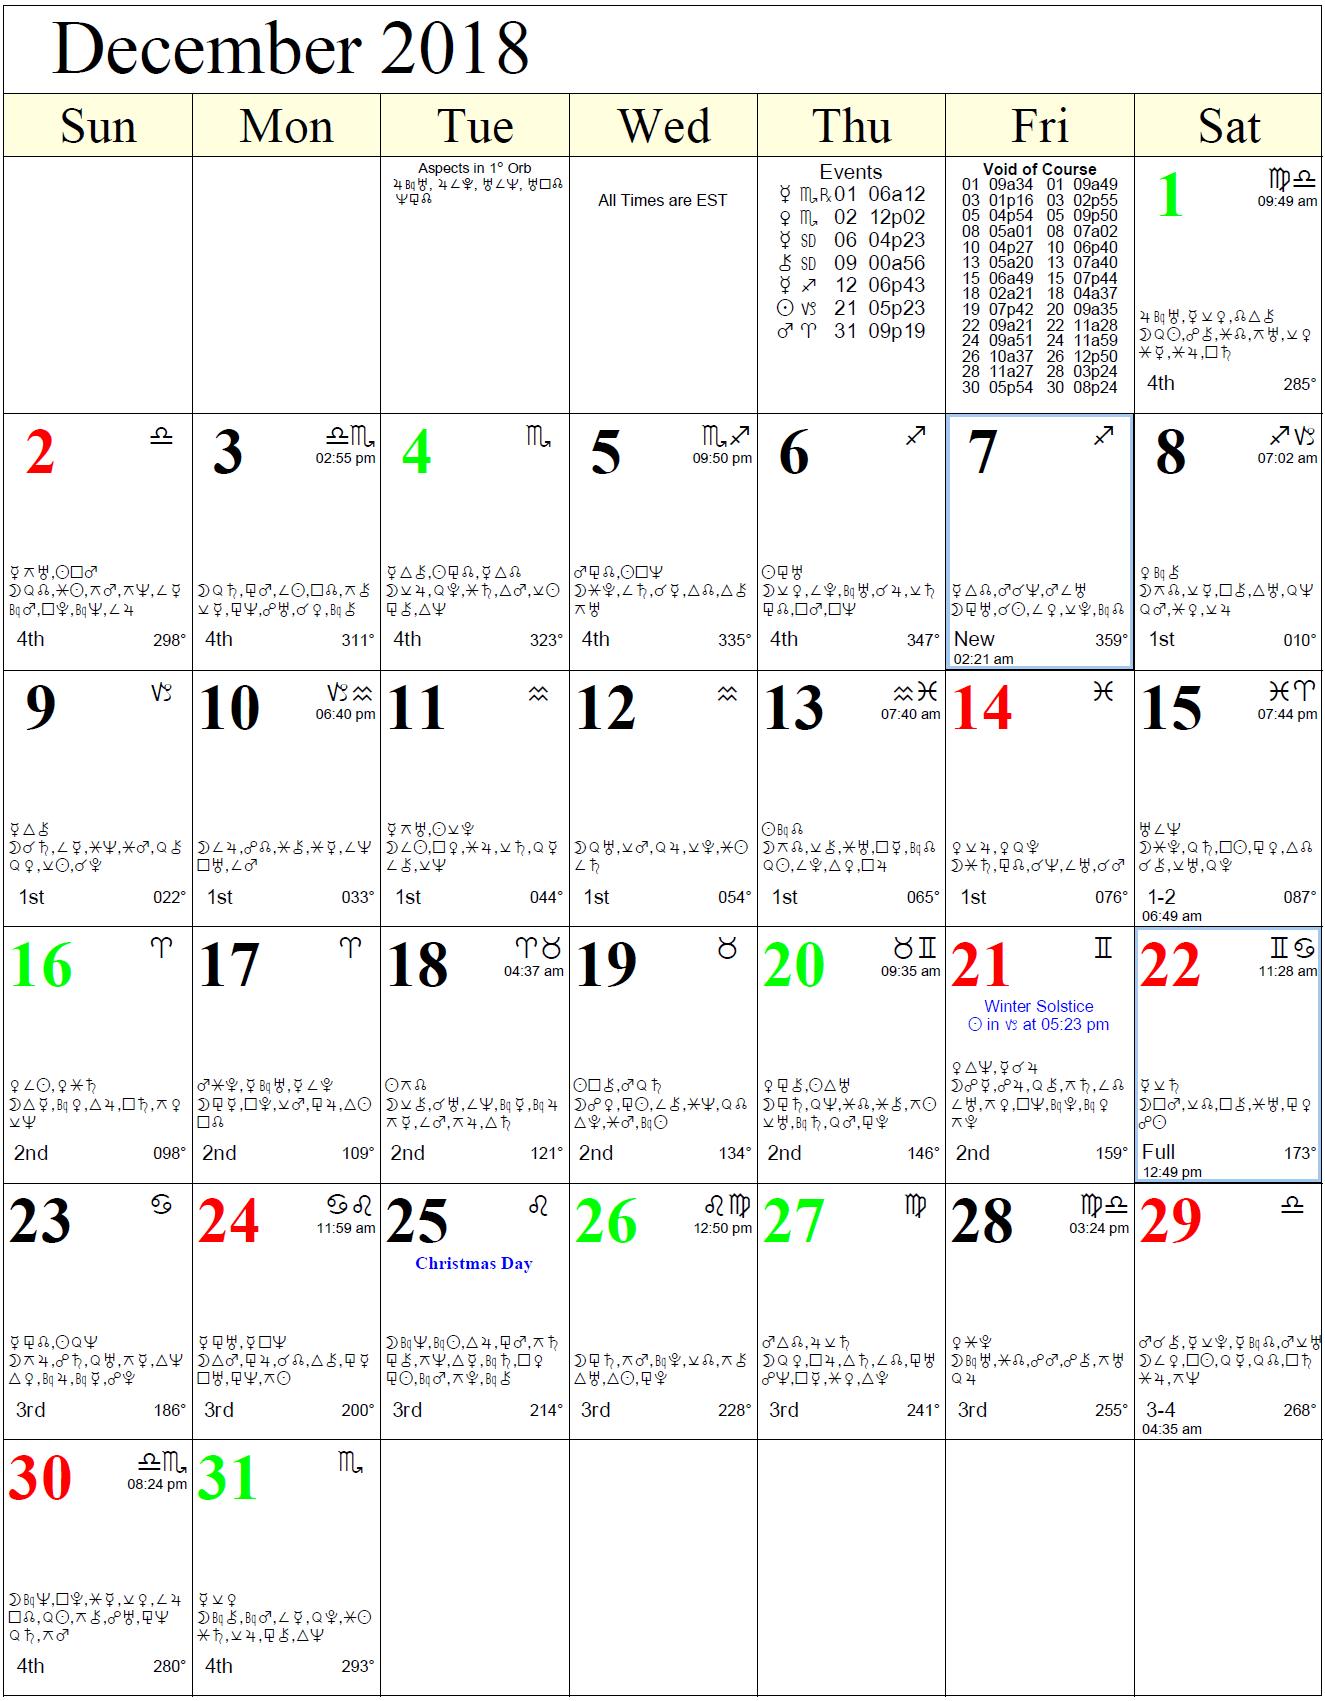 Pisces Good Days Calendar For December 2018 Regarding Cafe Astrology Good Days Calendar